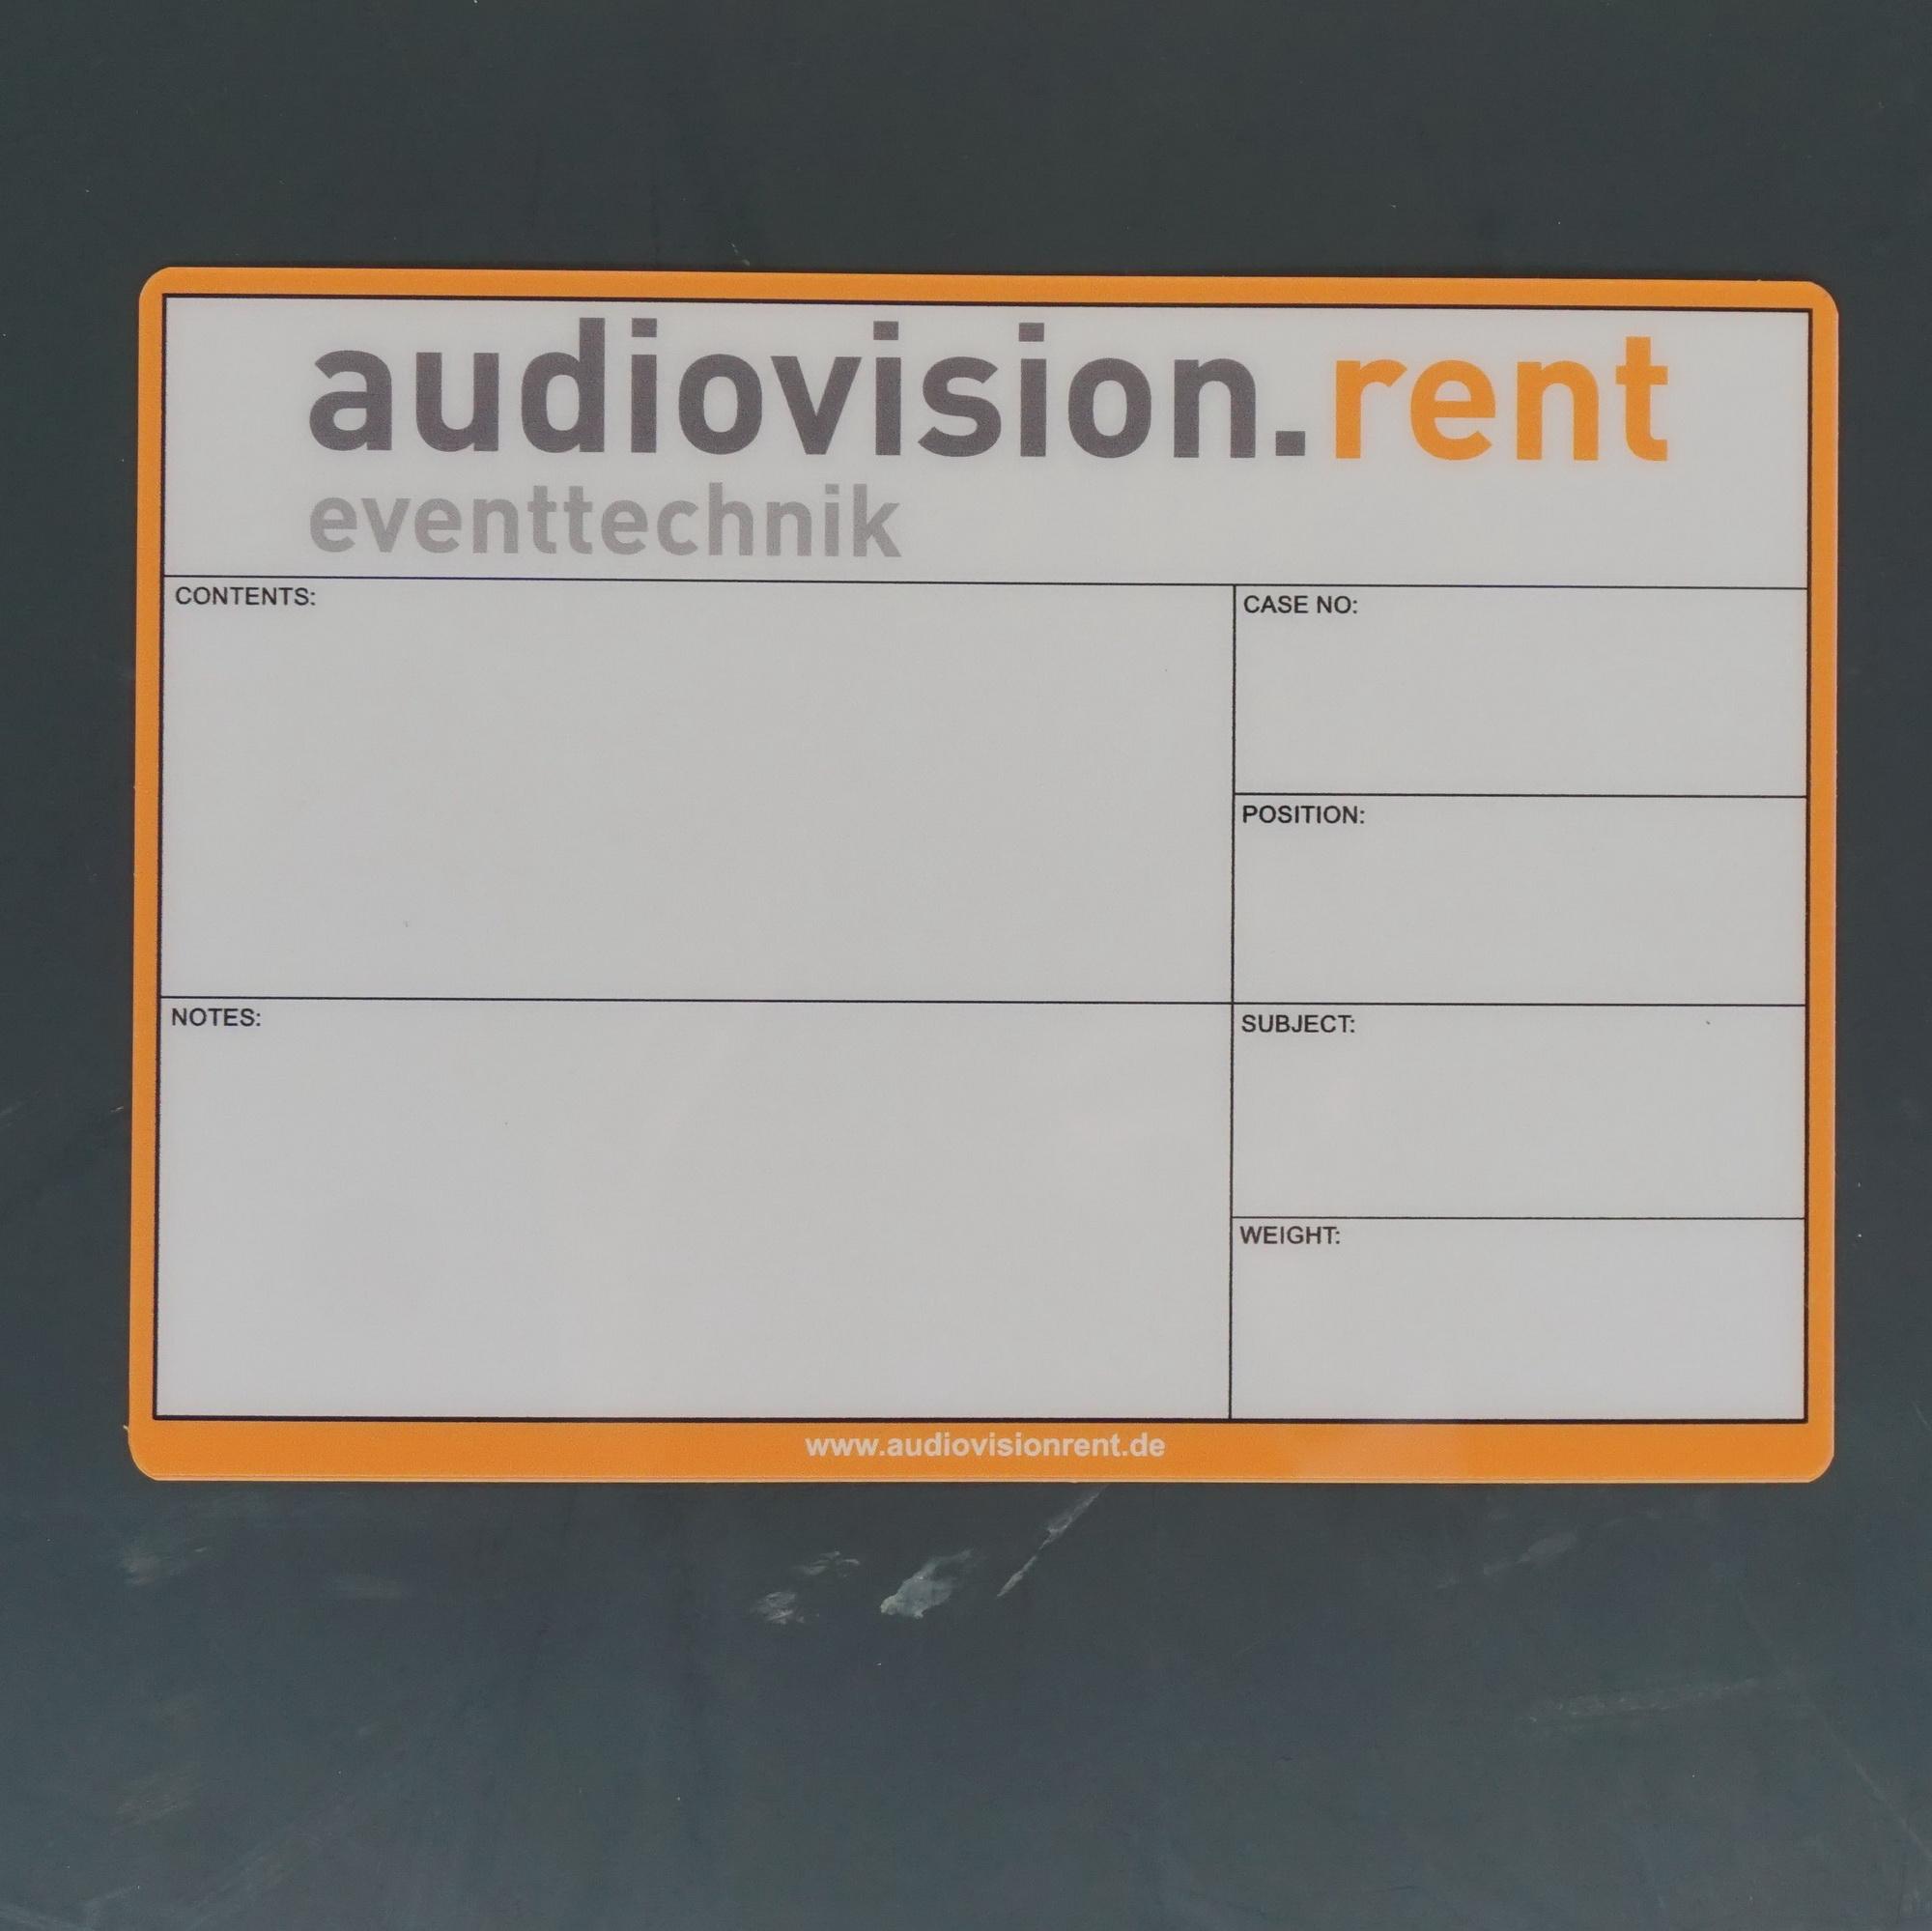 Flightcaselabels Caselabels audiovision